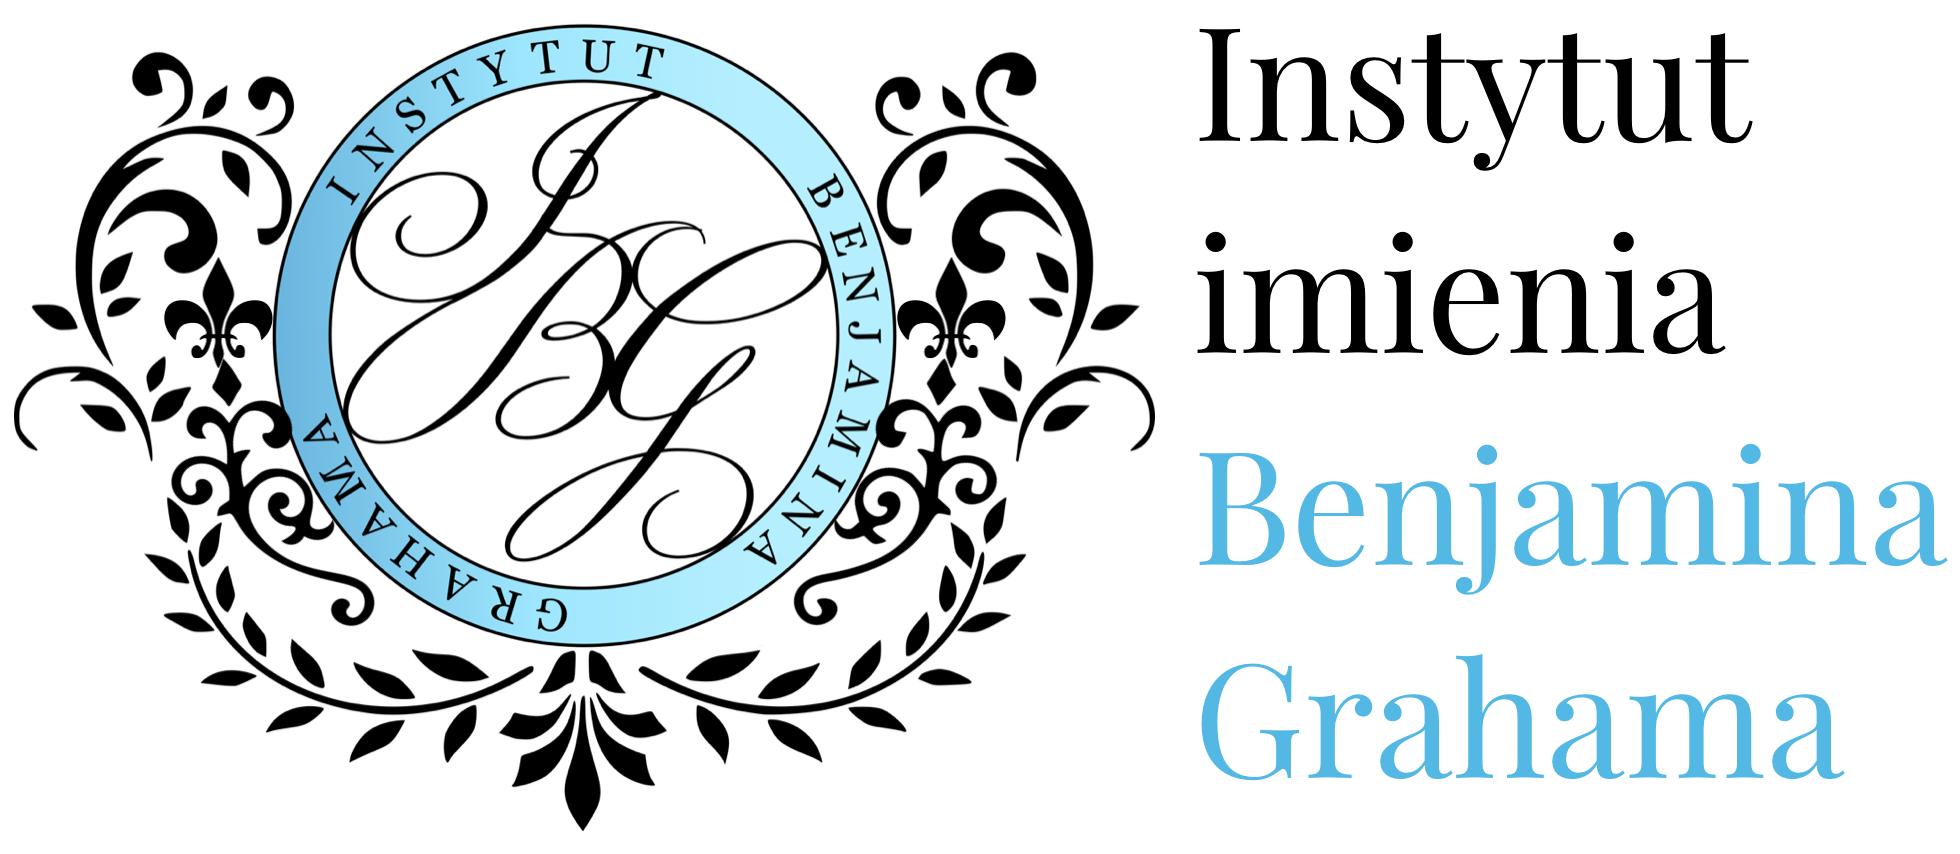 Instytut Benjamina Grahama